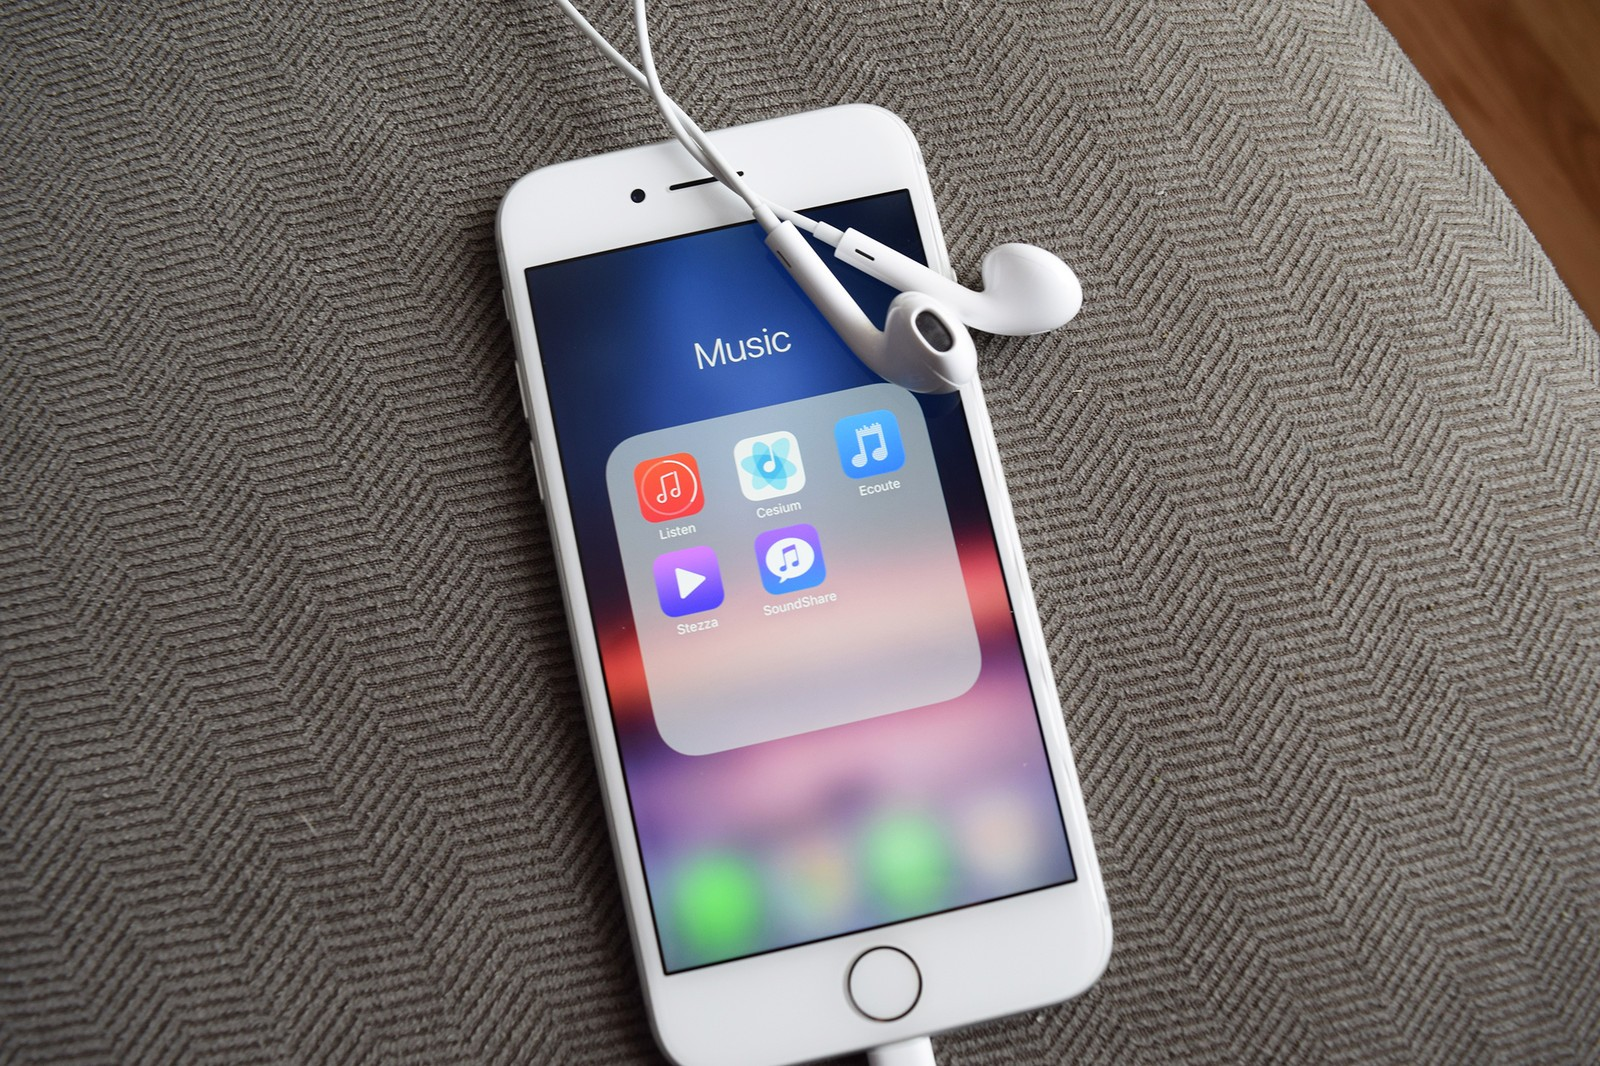 Come scaricare musica su iPhone senza iTunes